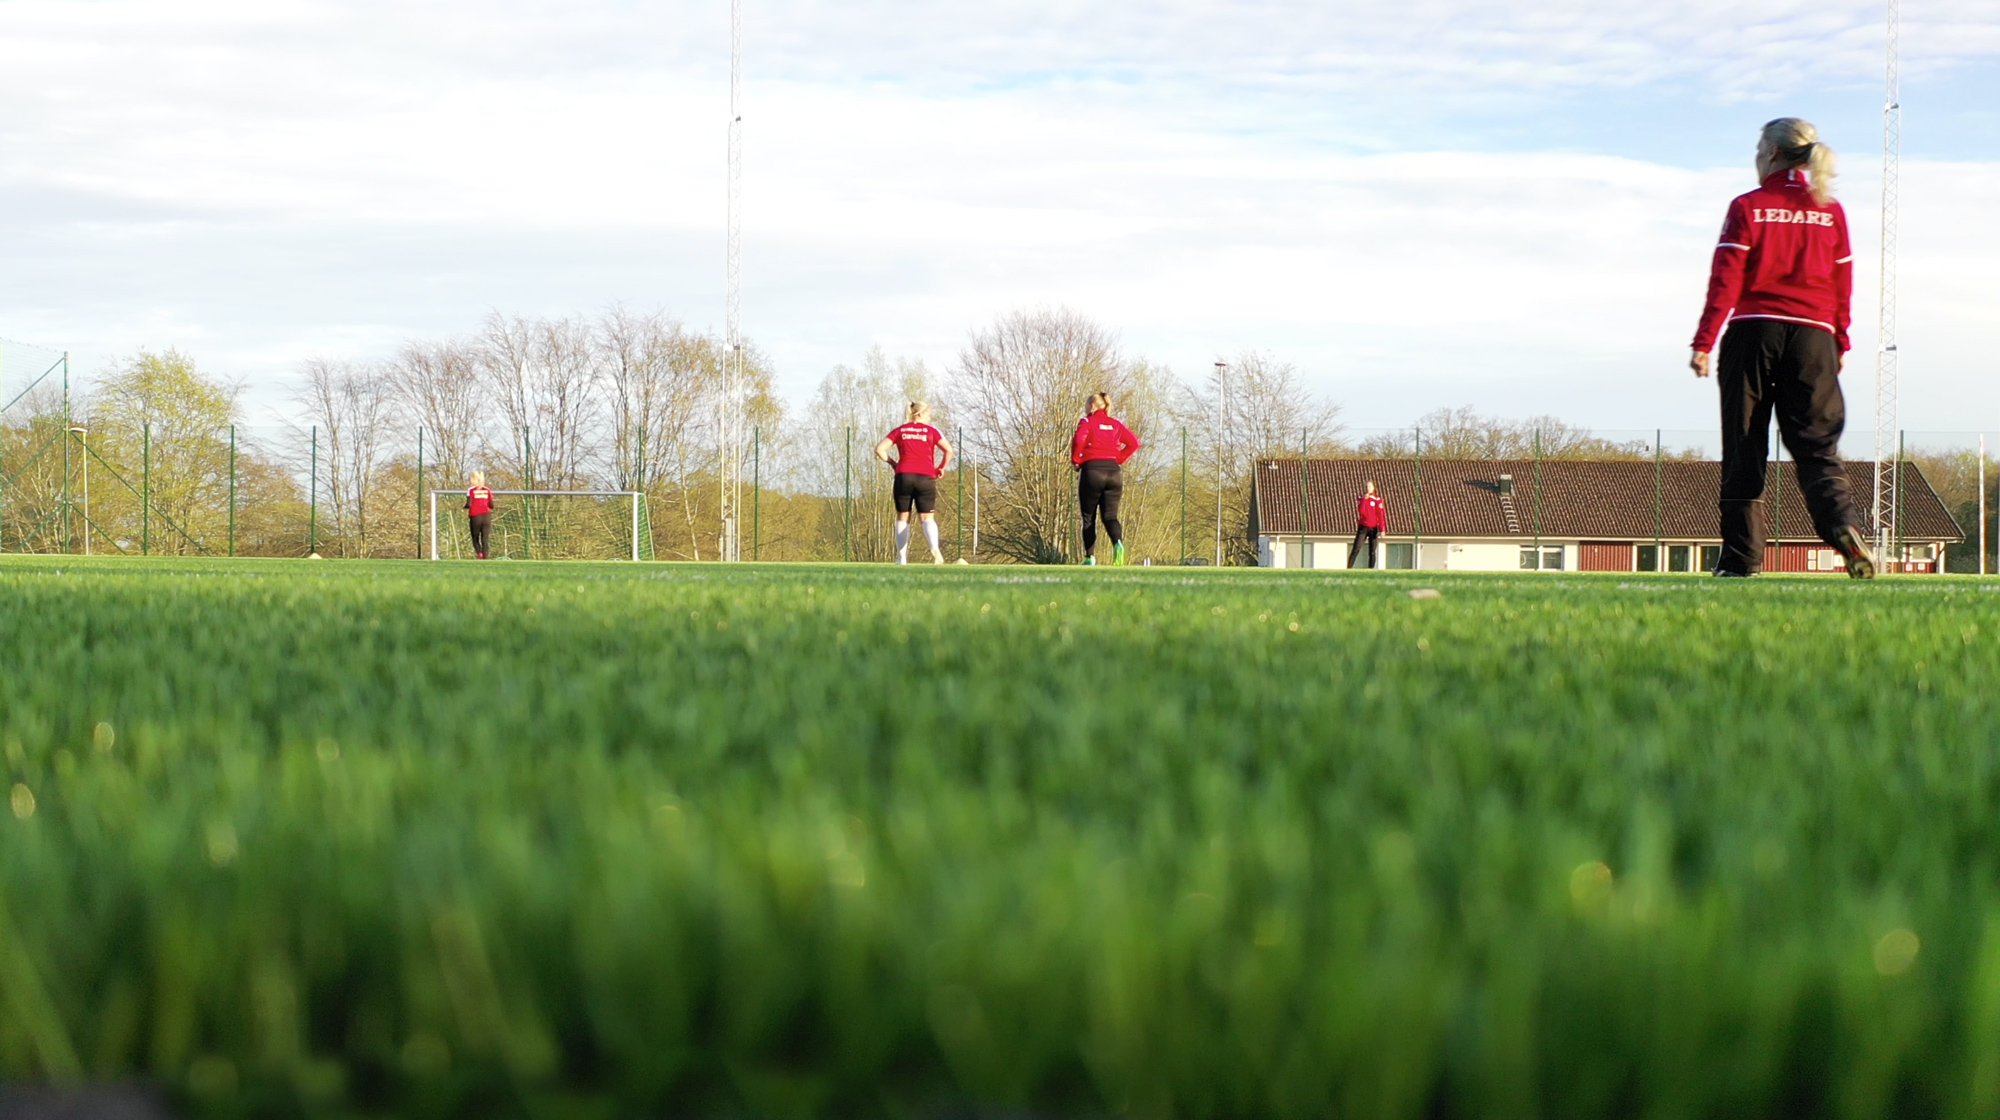 saltex biofill ifyllnadsgraulat miljöanpassat från unisport